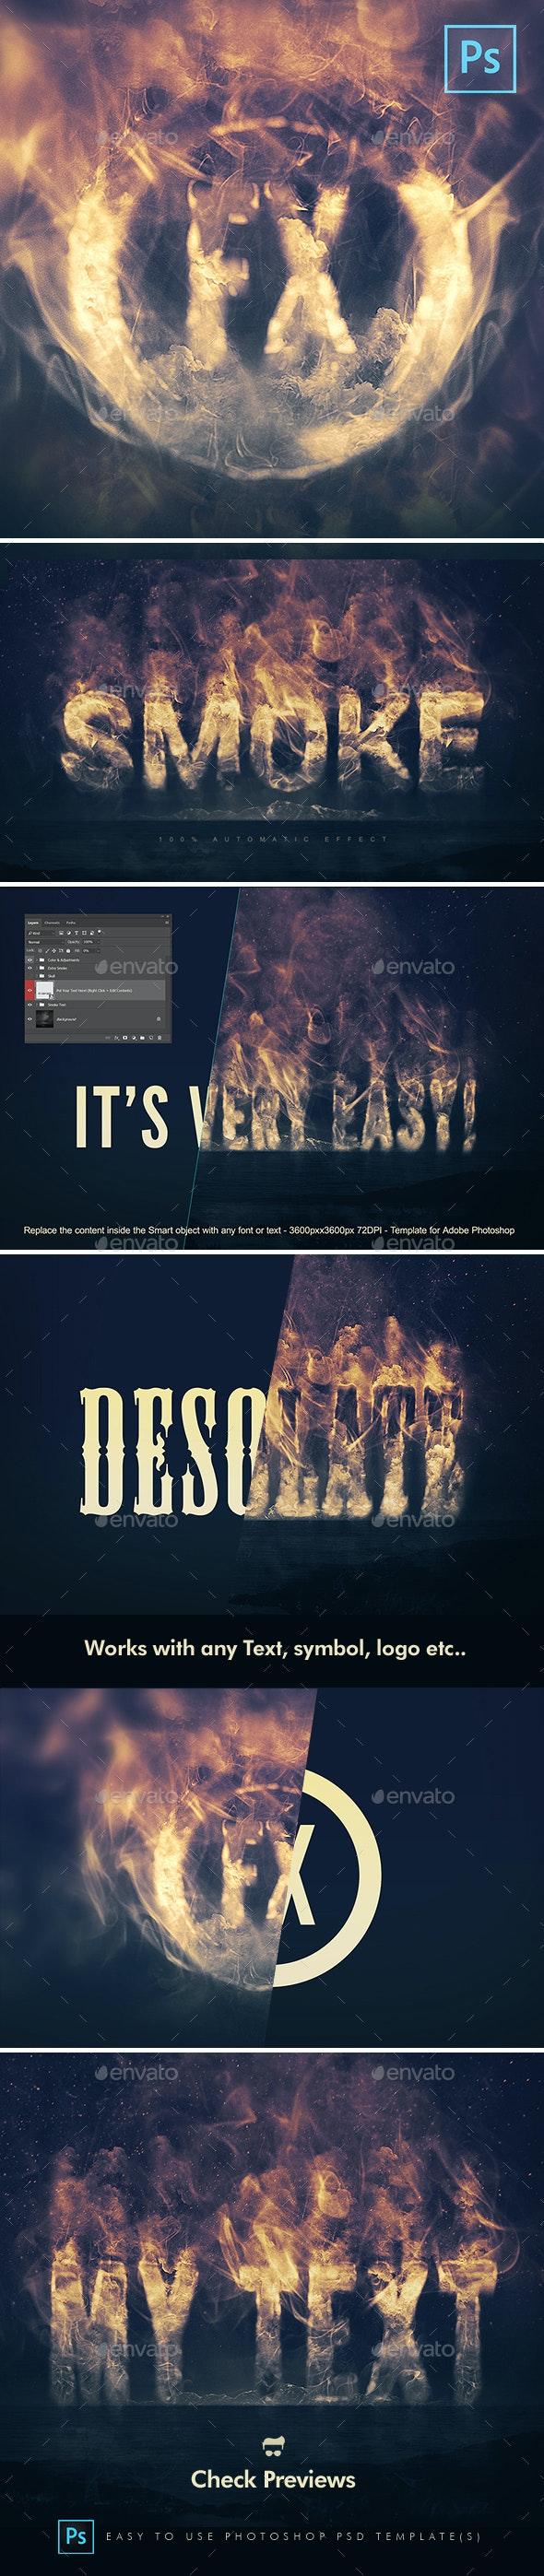 Smoke Logo Text Effect - Tech / Futuristic Photo Templates